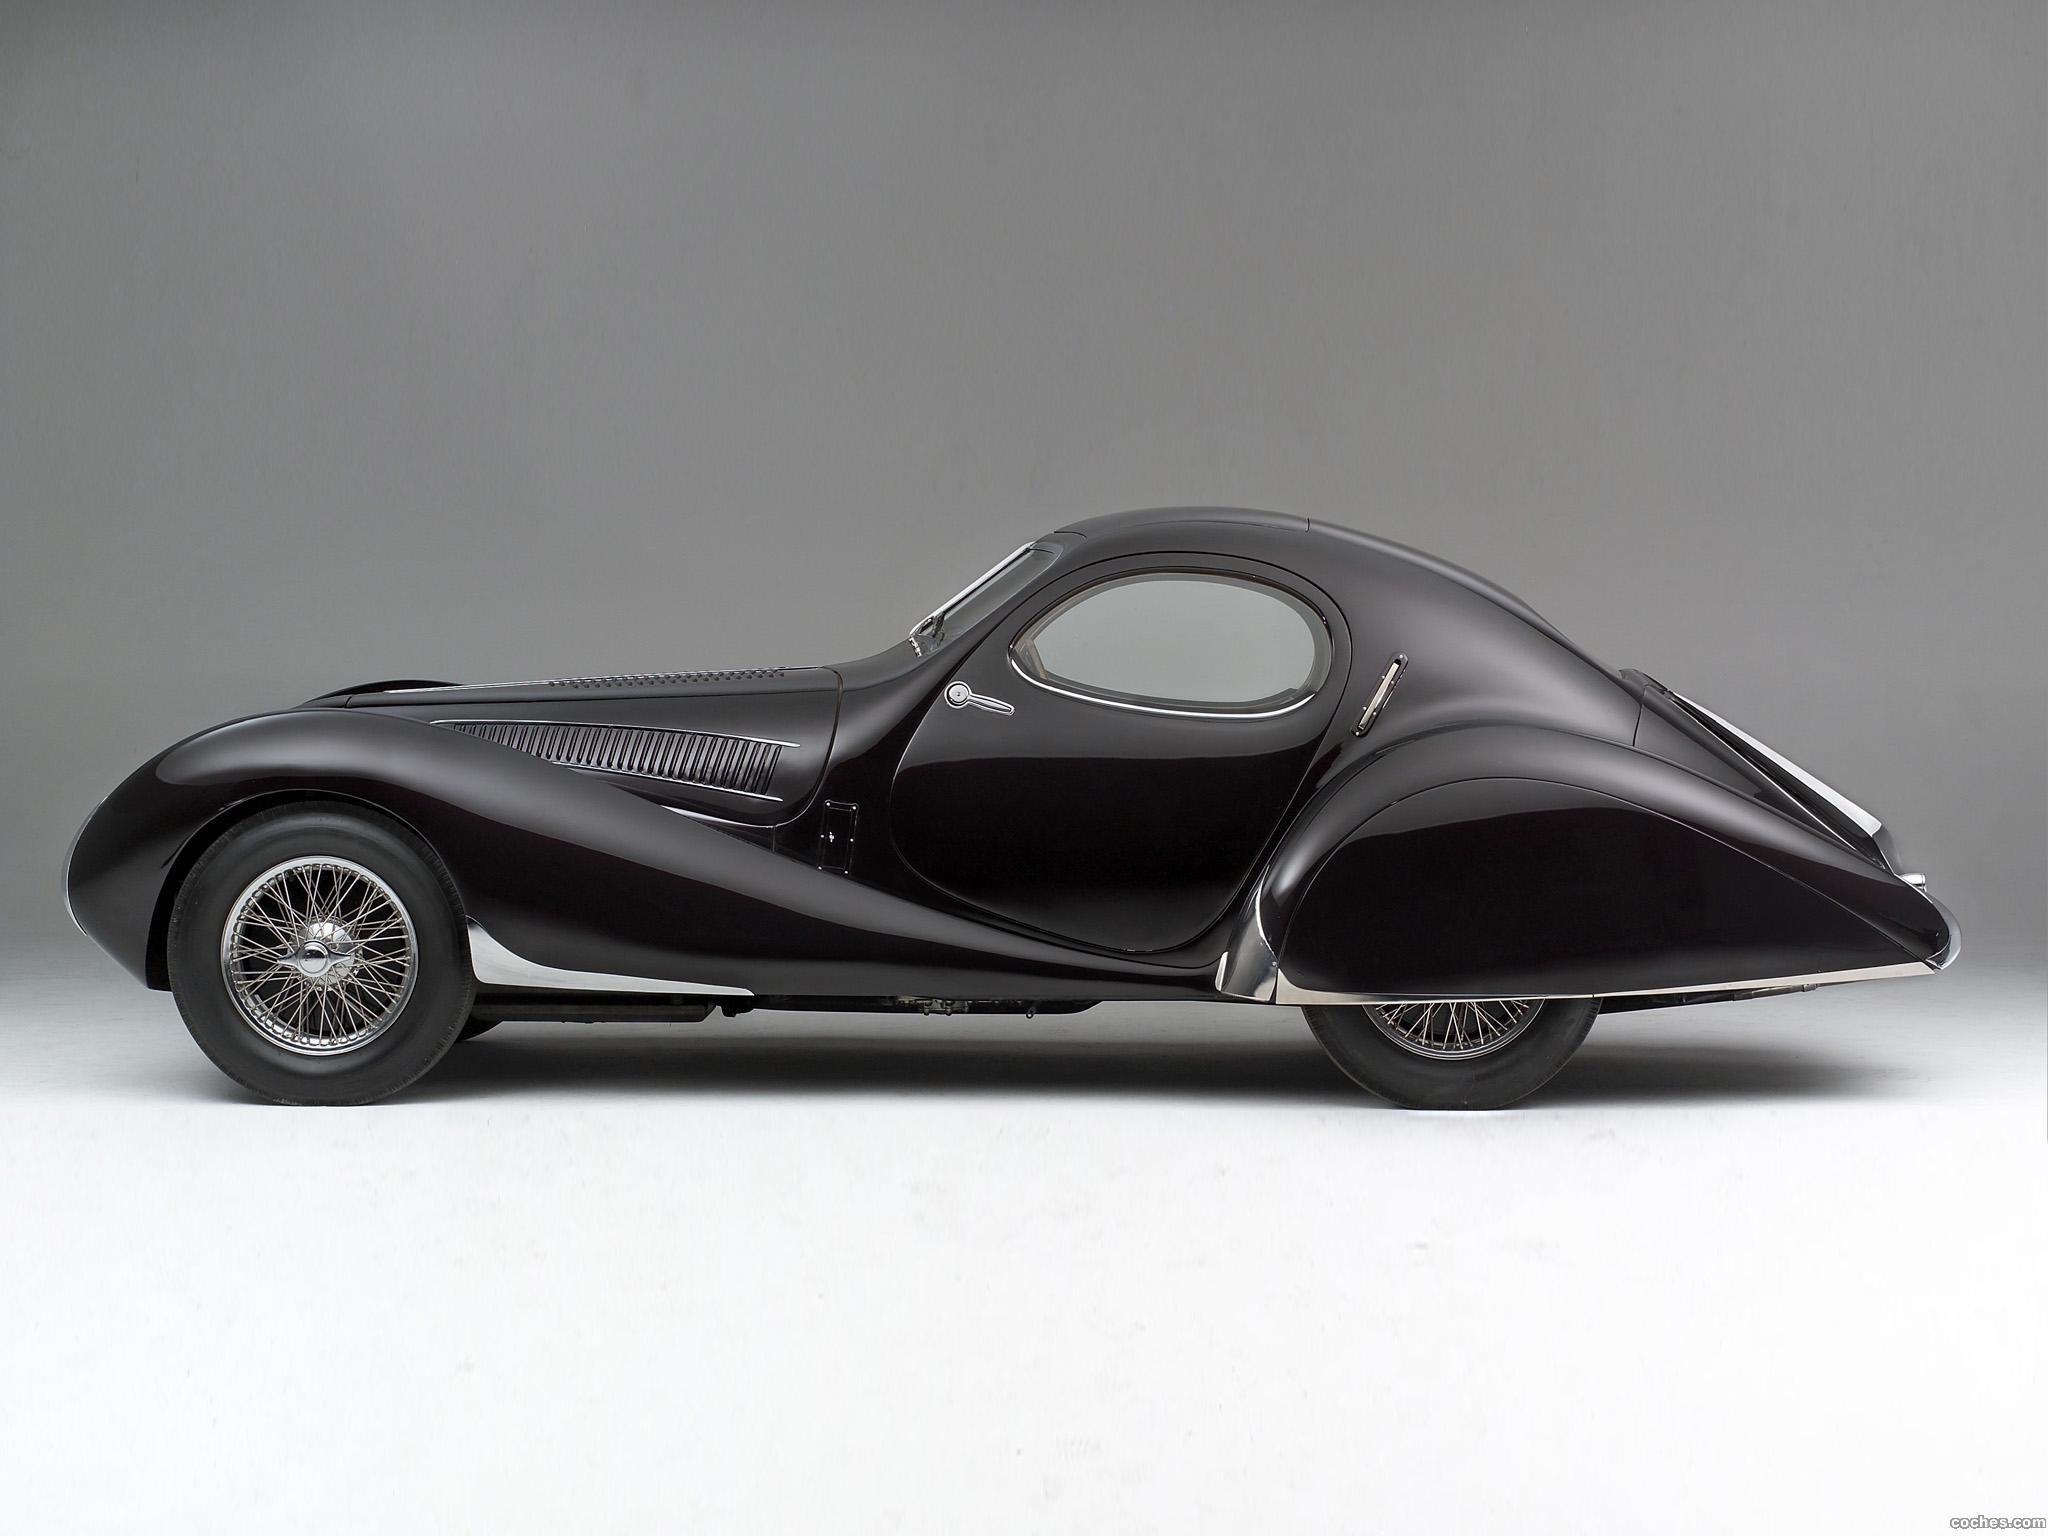 Foto 7 de Talbot Lago T150C Figoni et Falaschi 1938